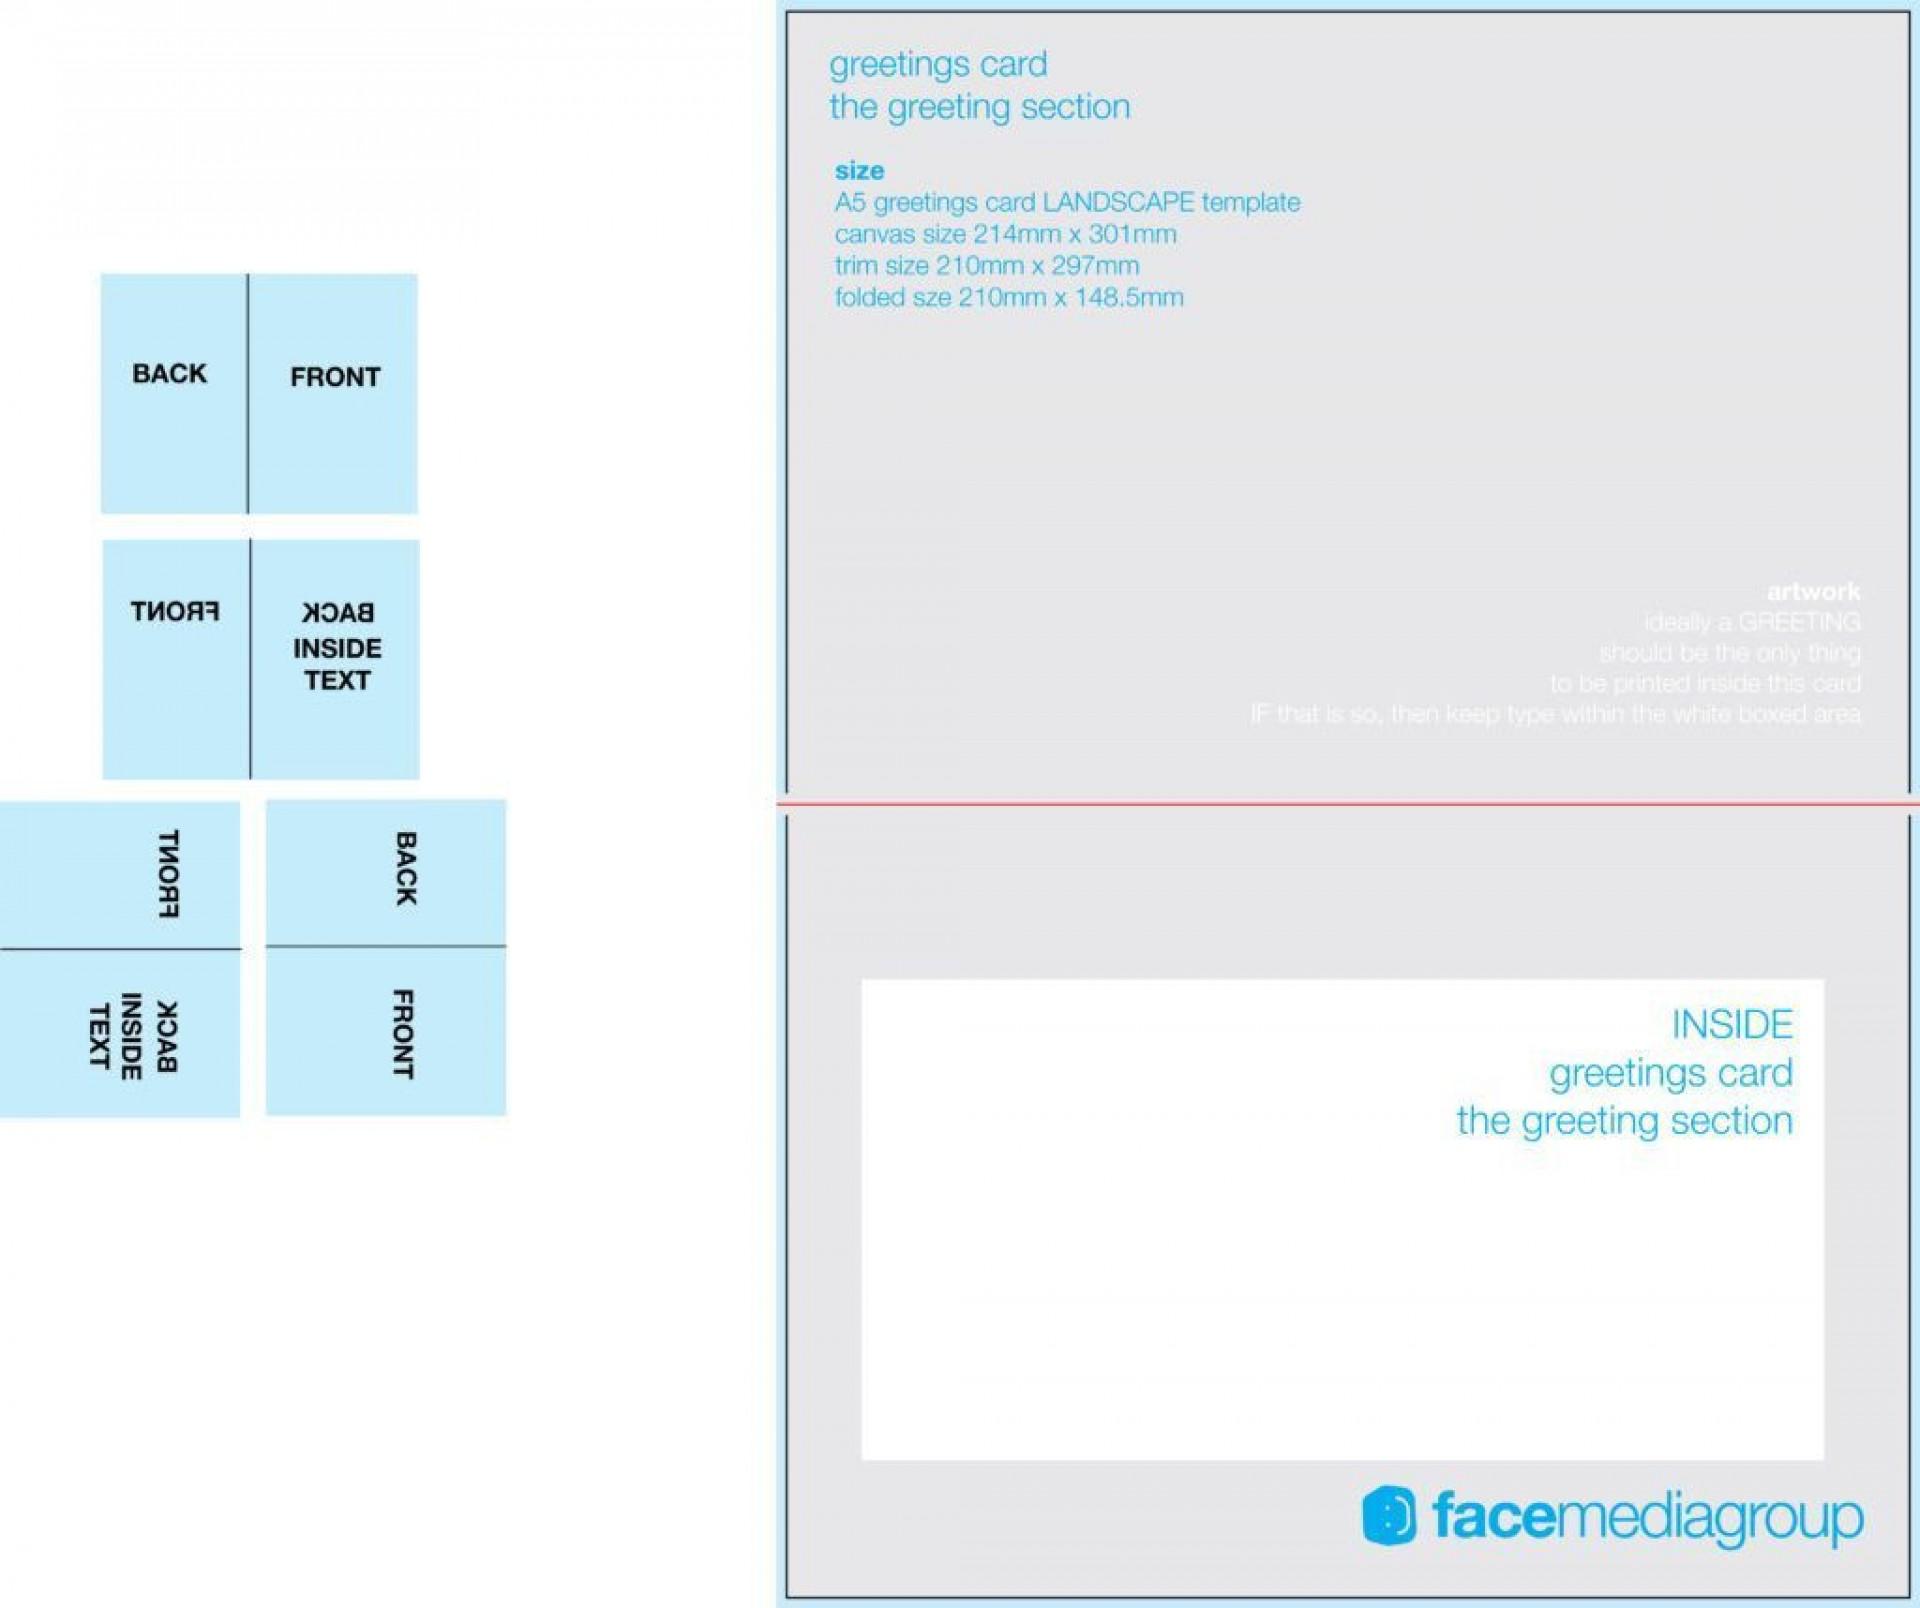 005 Awful Quarter Fold Card Template Word Blank High Resolution 1920